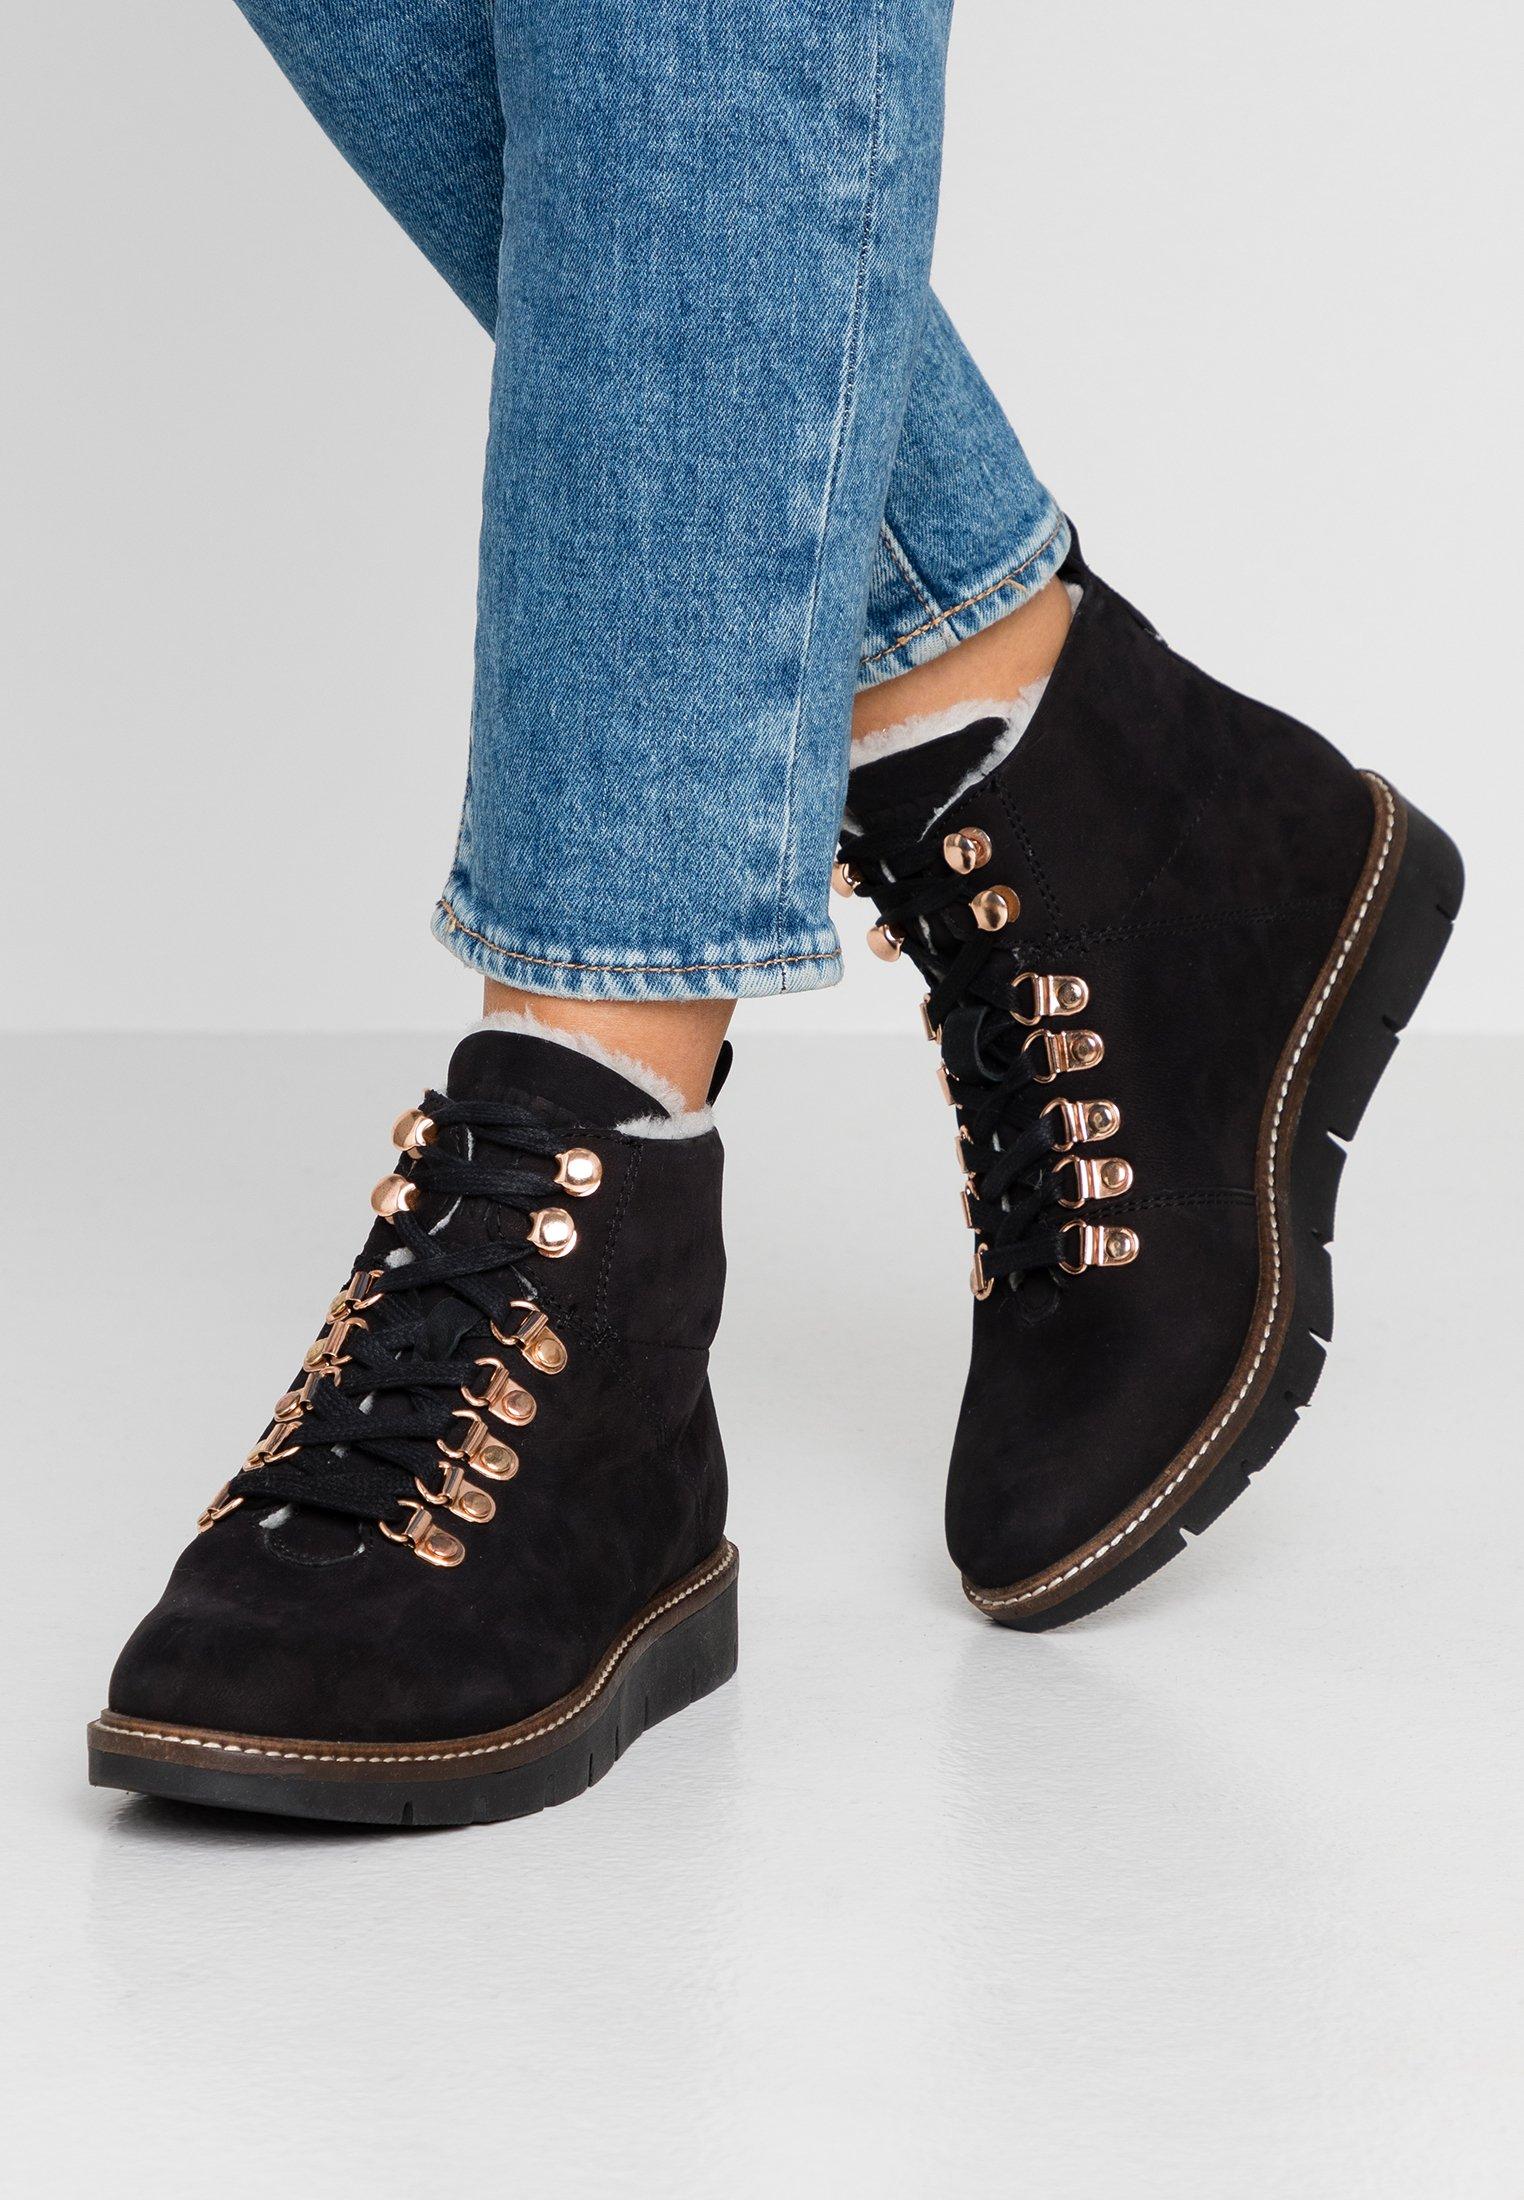 Superdry STUDIO HIKER- Ankle Boot black